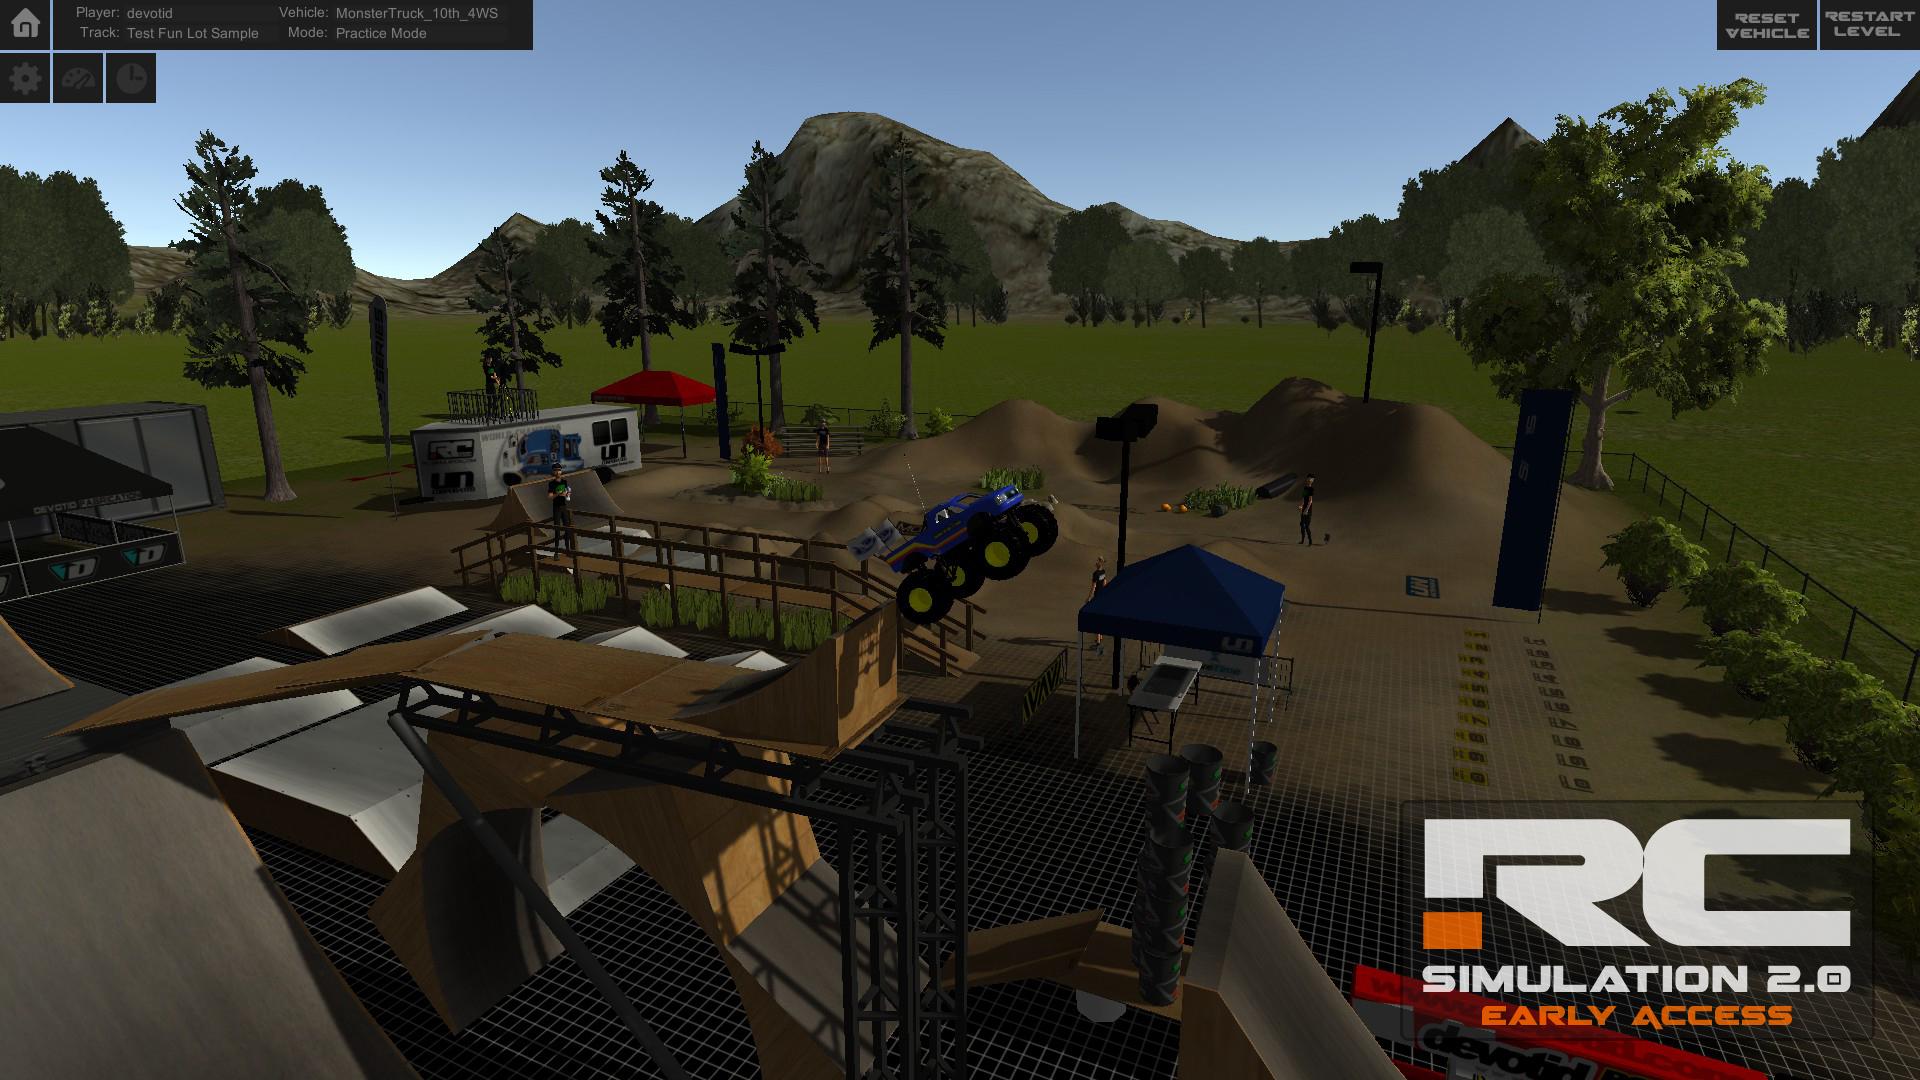 RC Simulation 2.0 screenshot